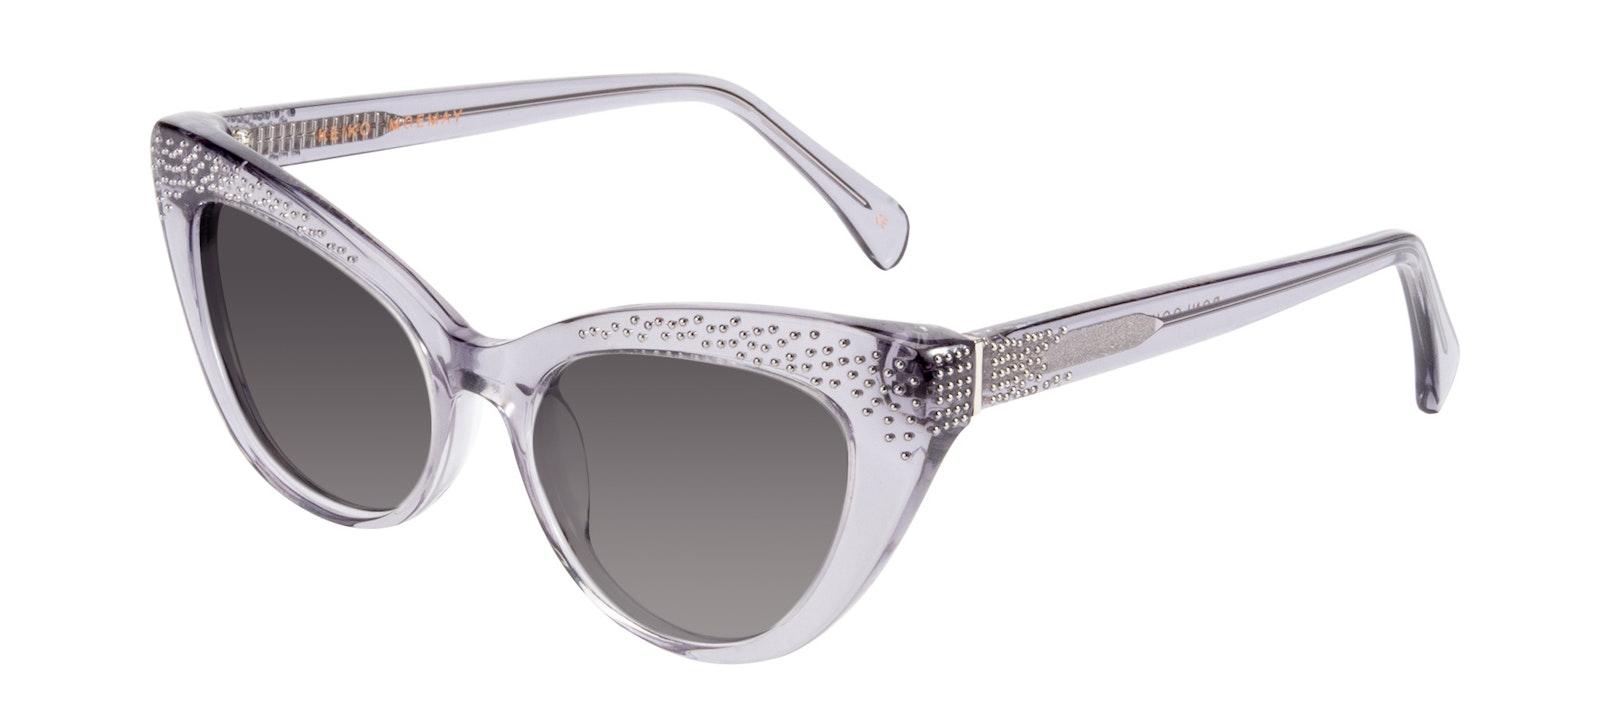 Affordable Fashion Glasses Cat Eye Daring Cateye Sunglasses Women Keiko Moe May Tilt